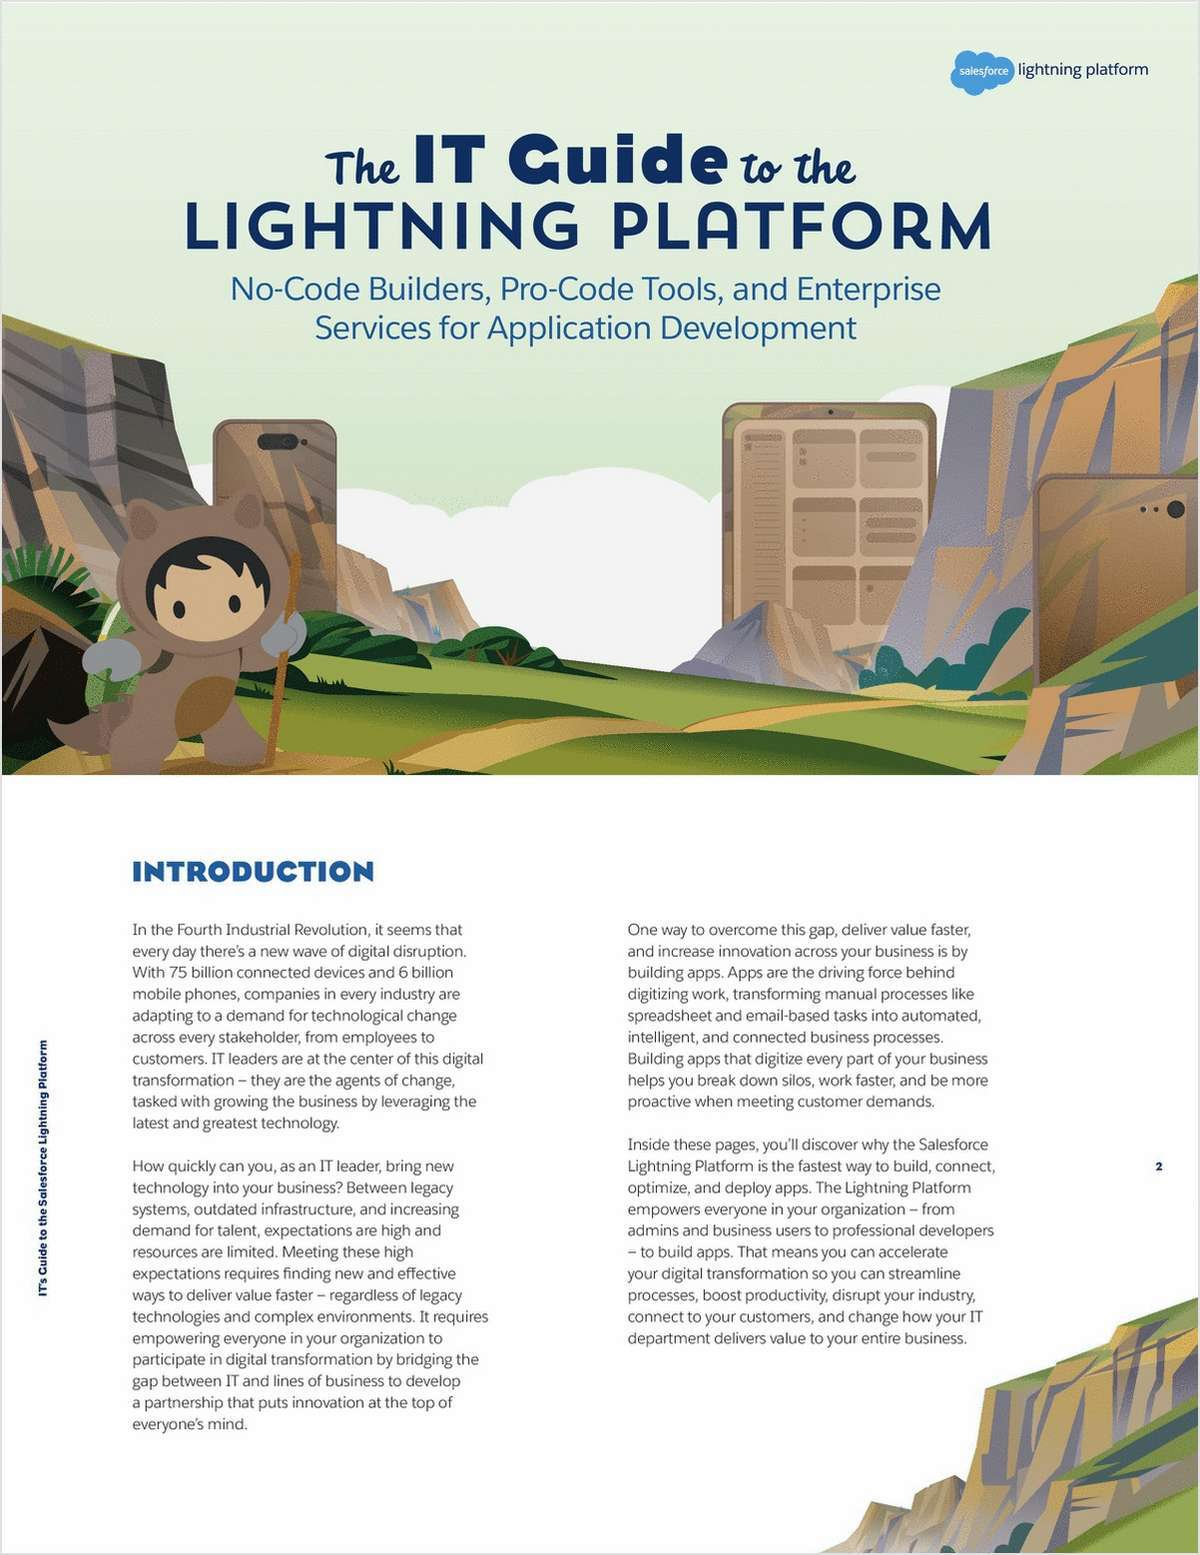 IT Guide to the Lightning Platform - Paperpicks Leading